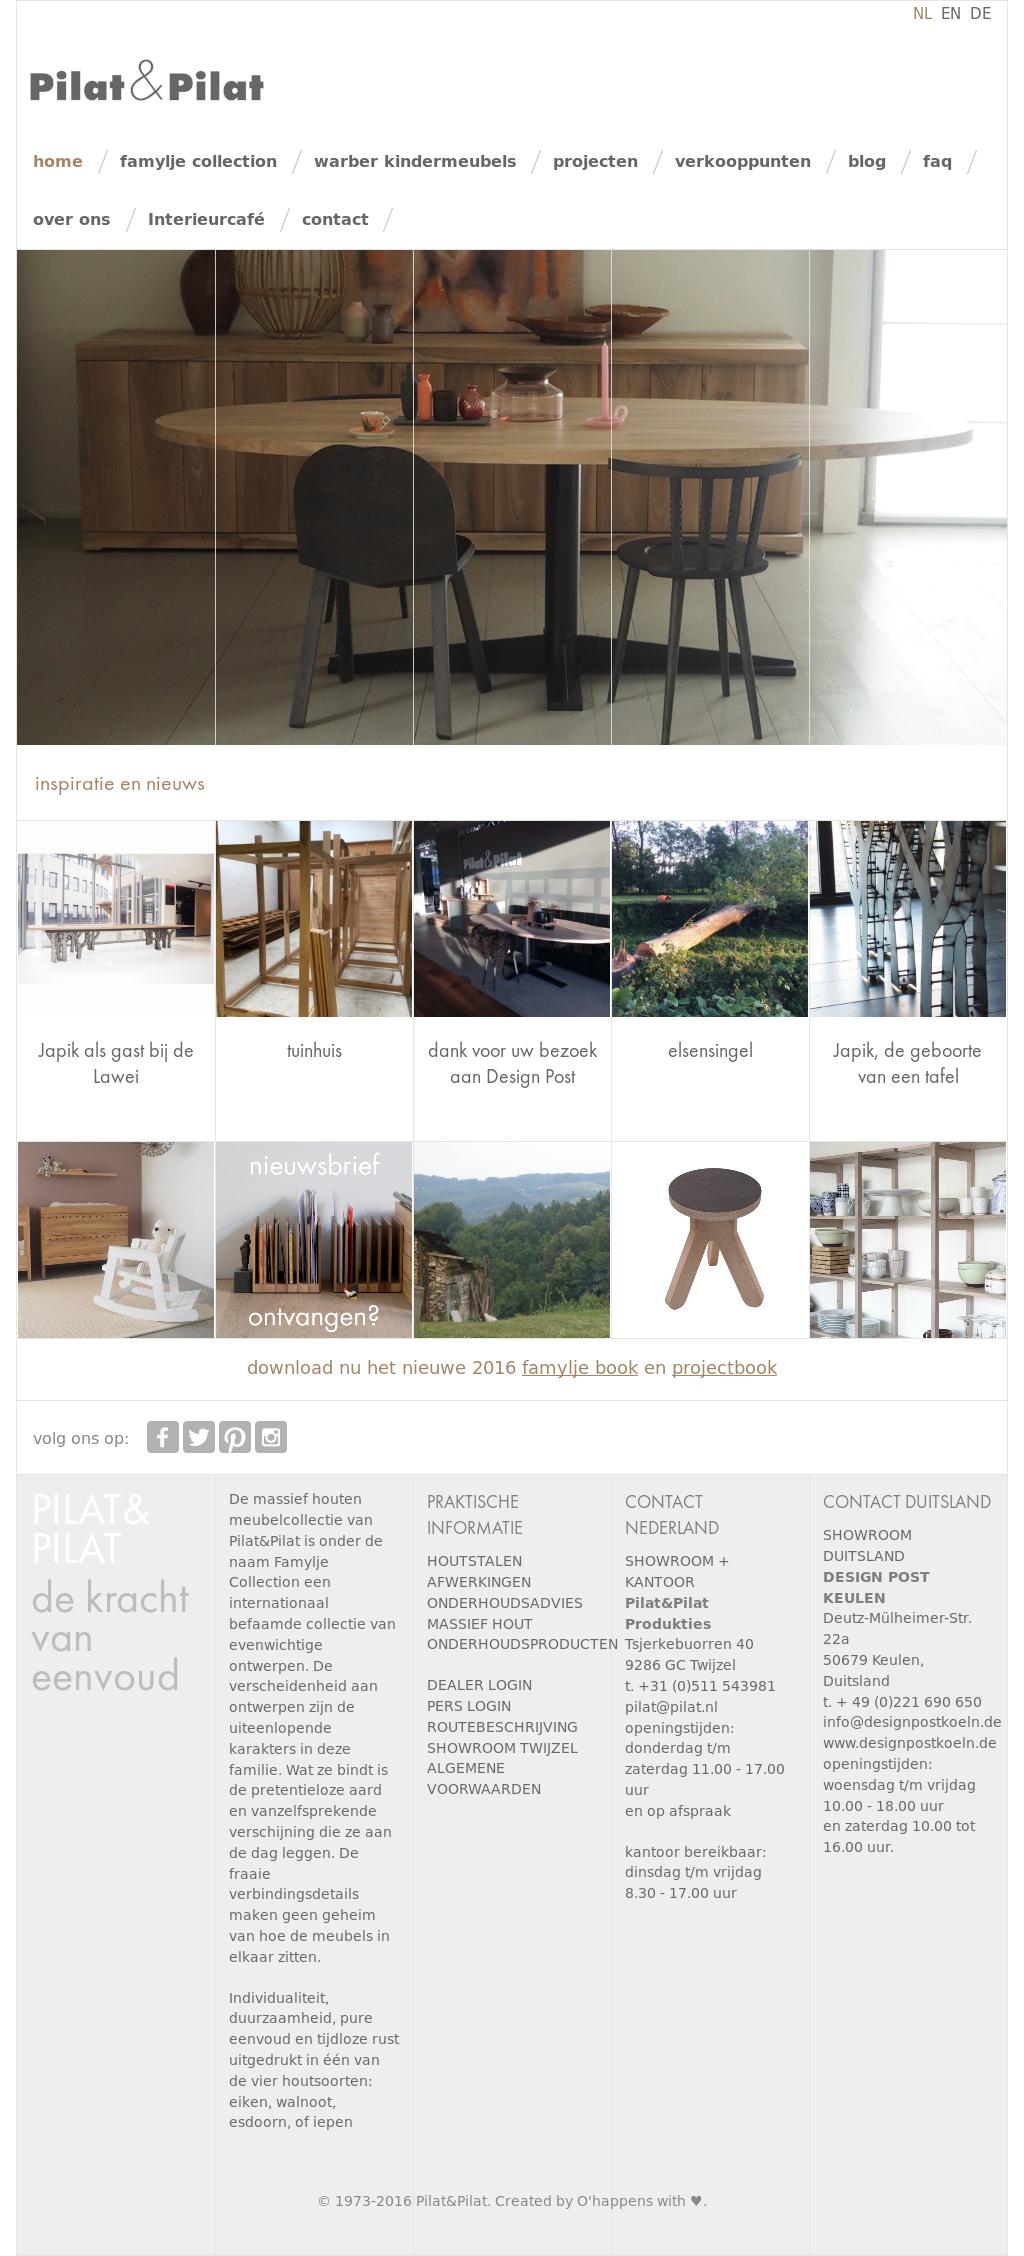 Showroom Meubels Design.Pilat Pilat Competitors Revenue And Employees Owler Company Profile